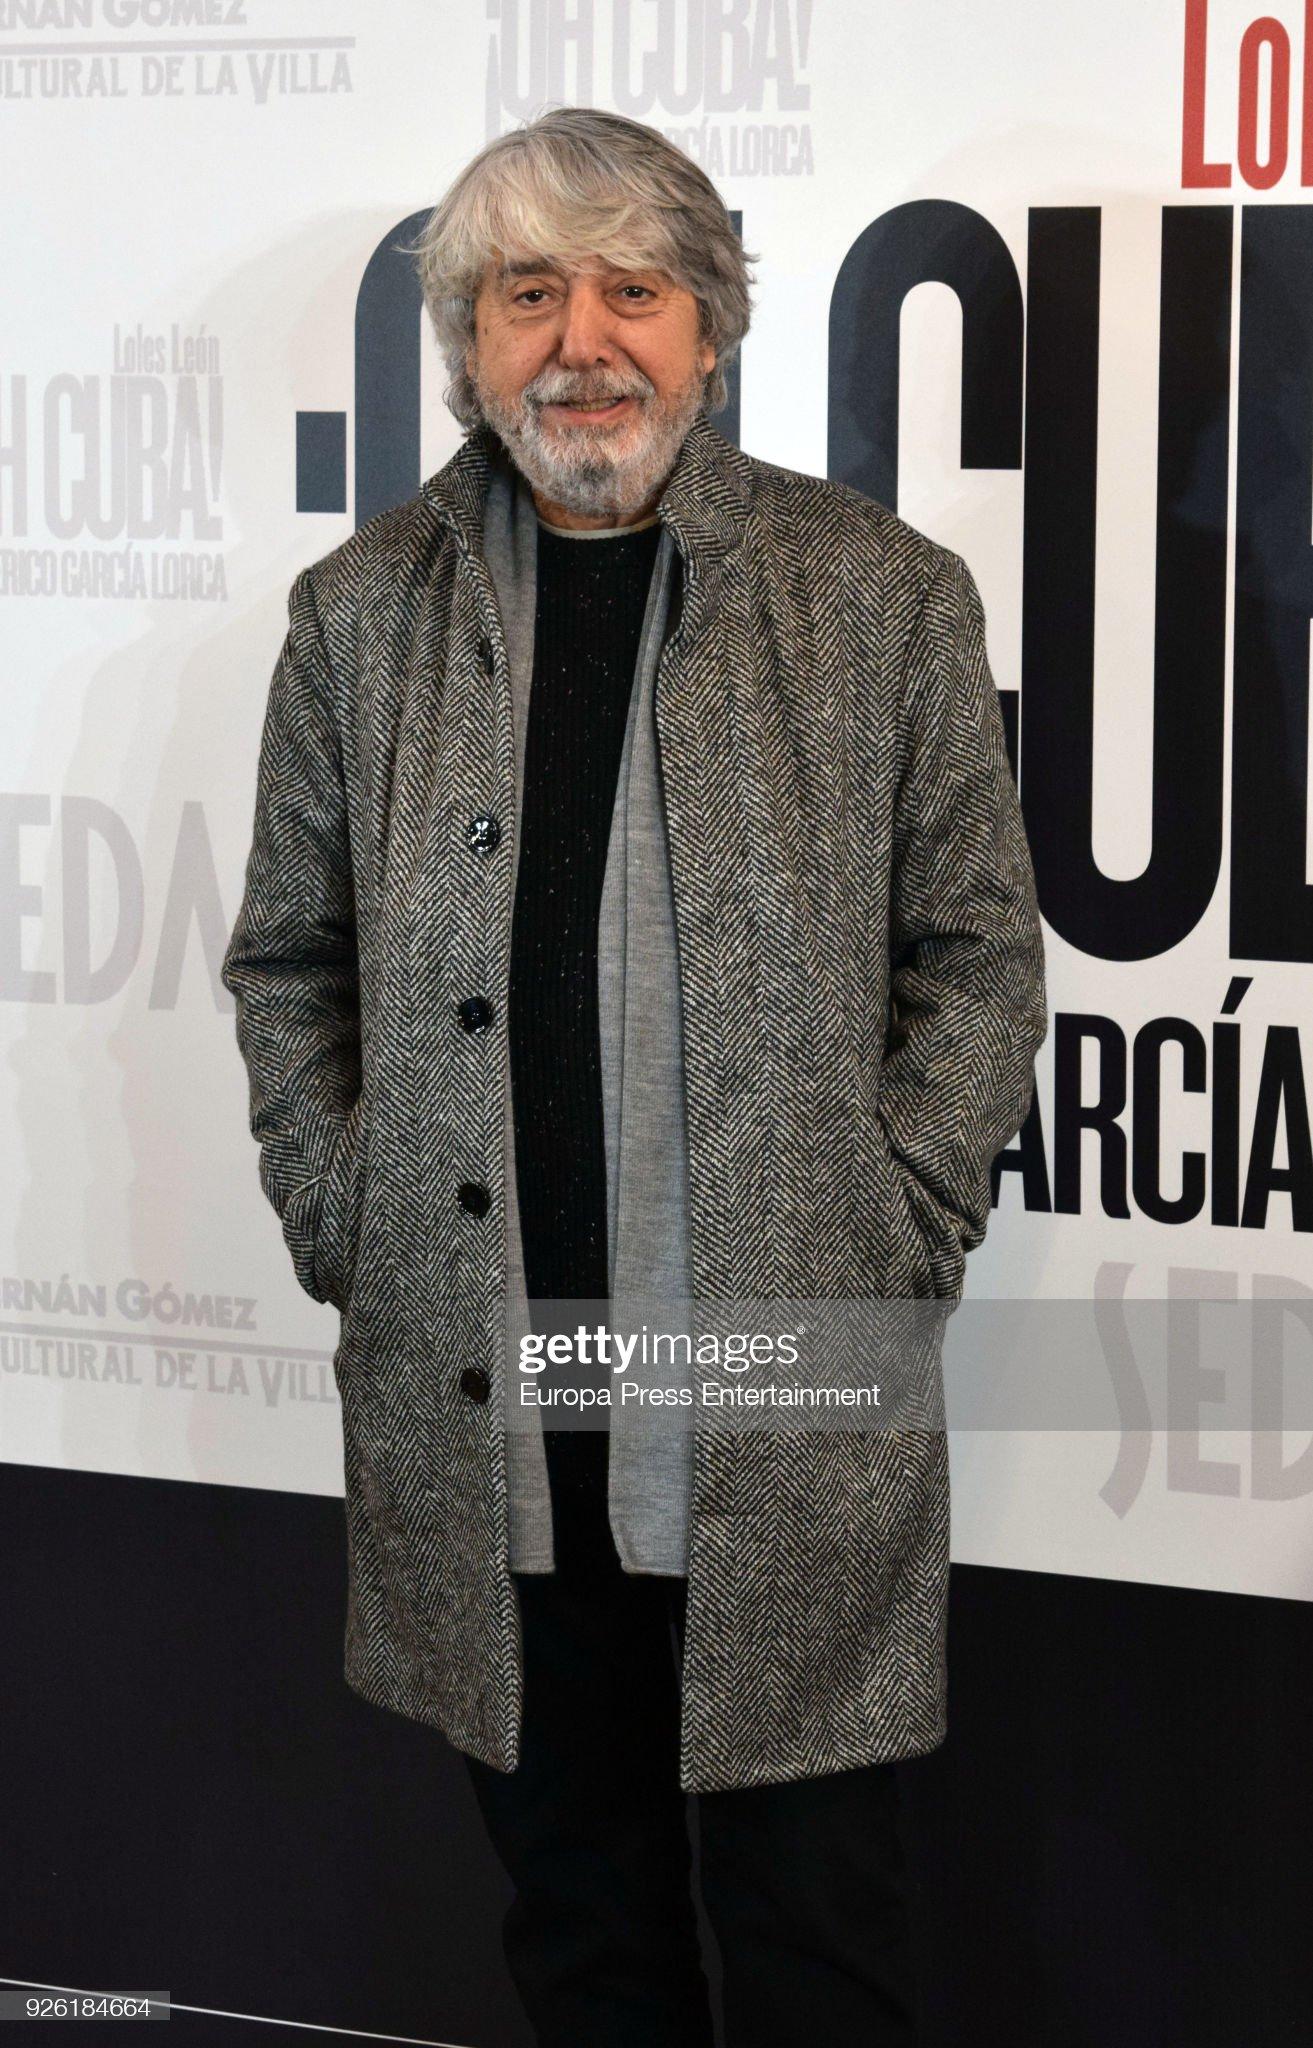 ¿Cuánto mide Ricardo Arroyo? - Altura Ricardo-arroyo-attends-oh-cuba-premiere-at-fernan-gomez-theater-on-1-picture-id926184664?s=2048x2048